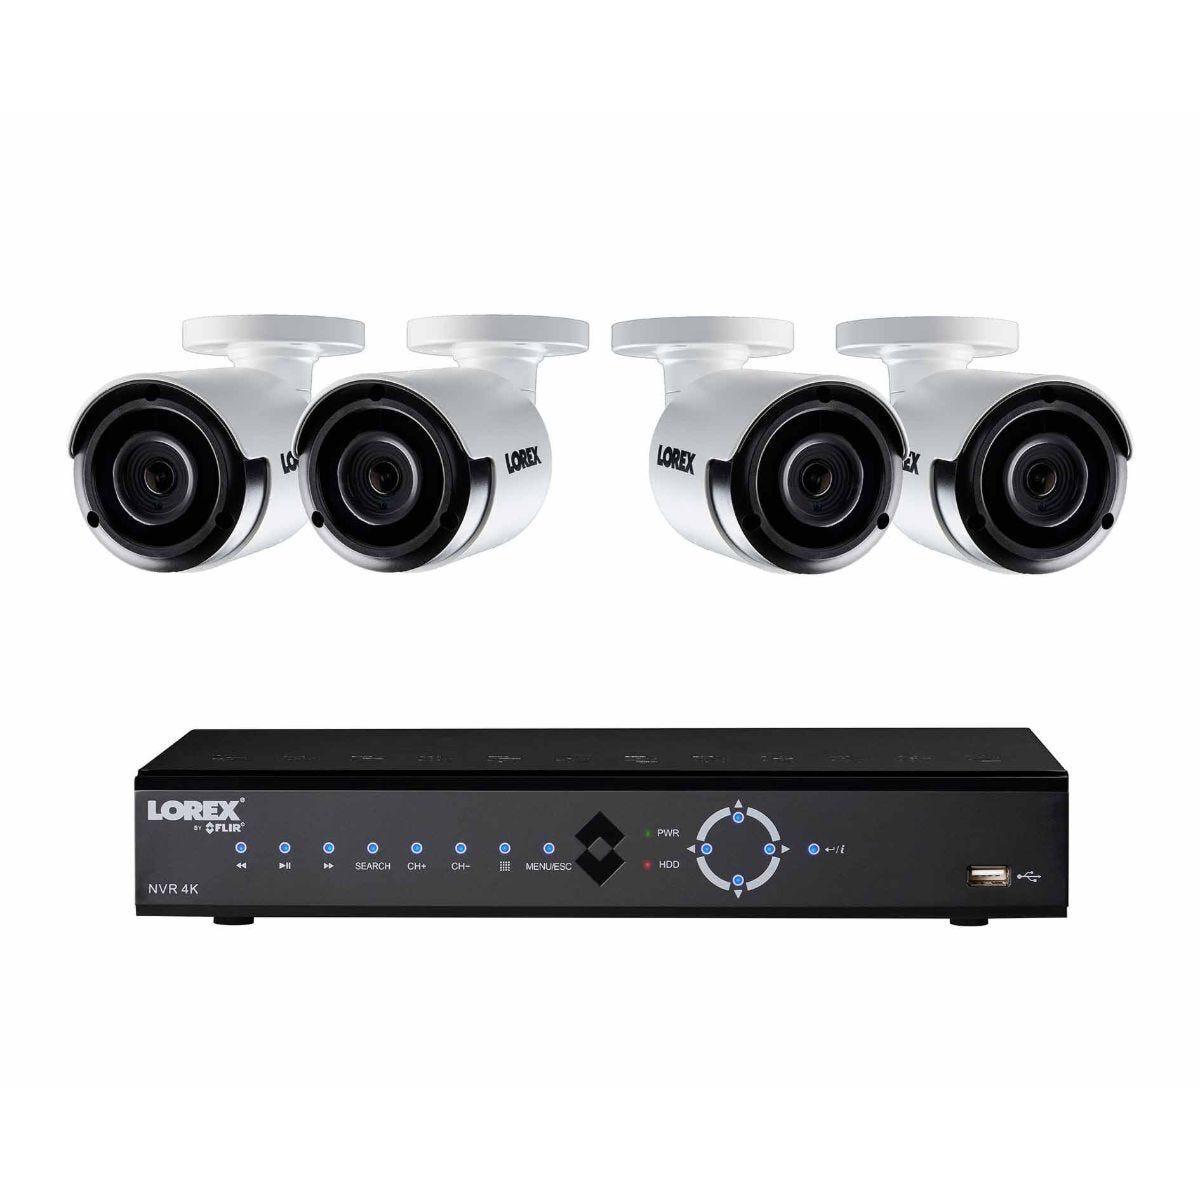 Lorex 8 Channel 2TB 4K NVR with 4 x 4MP Super HD Cameras